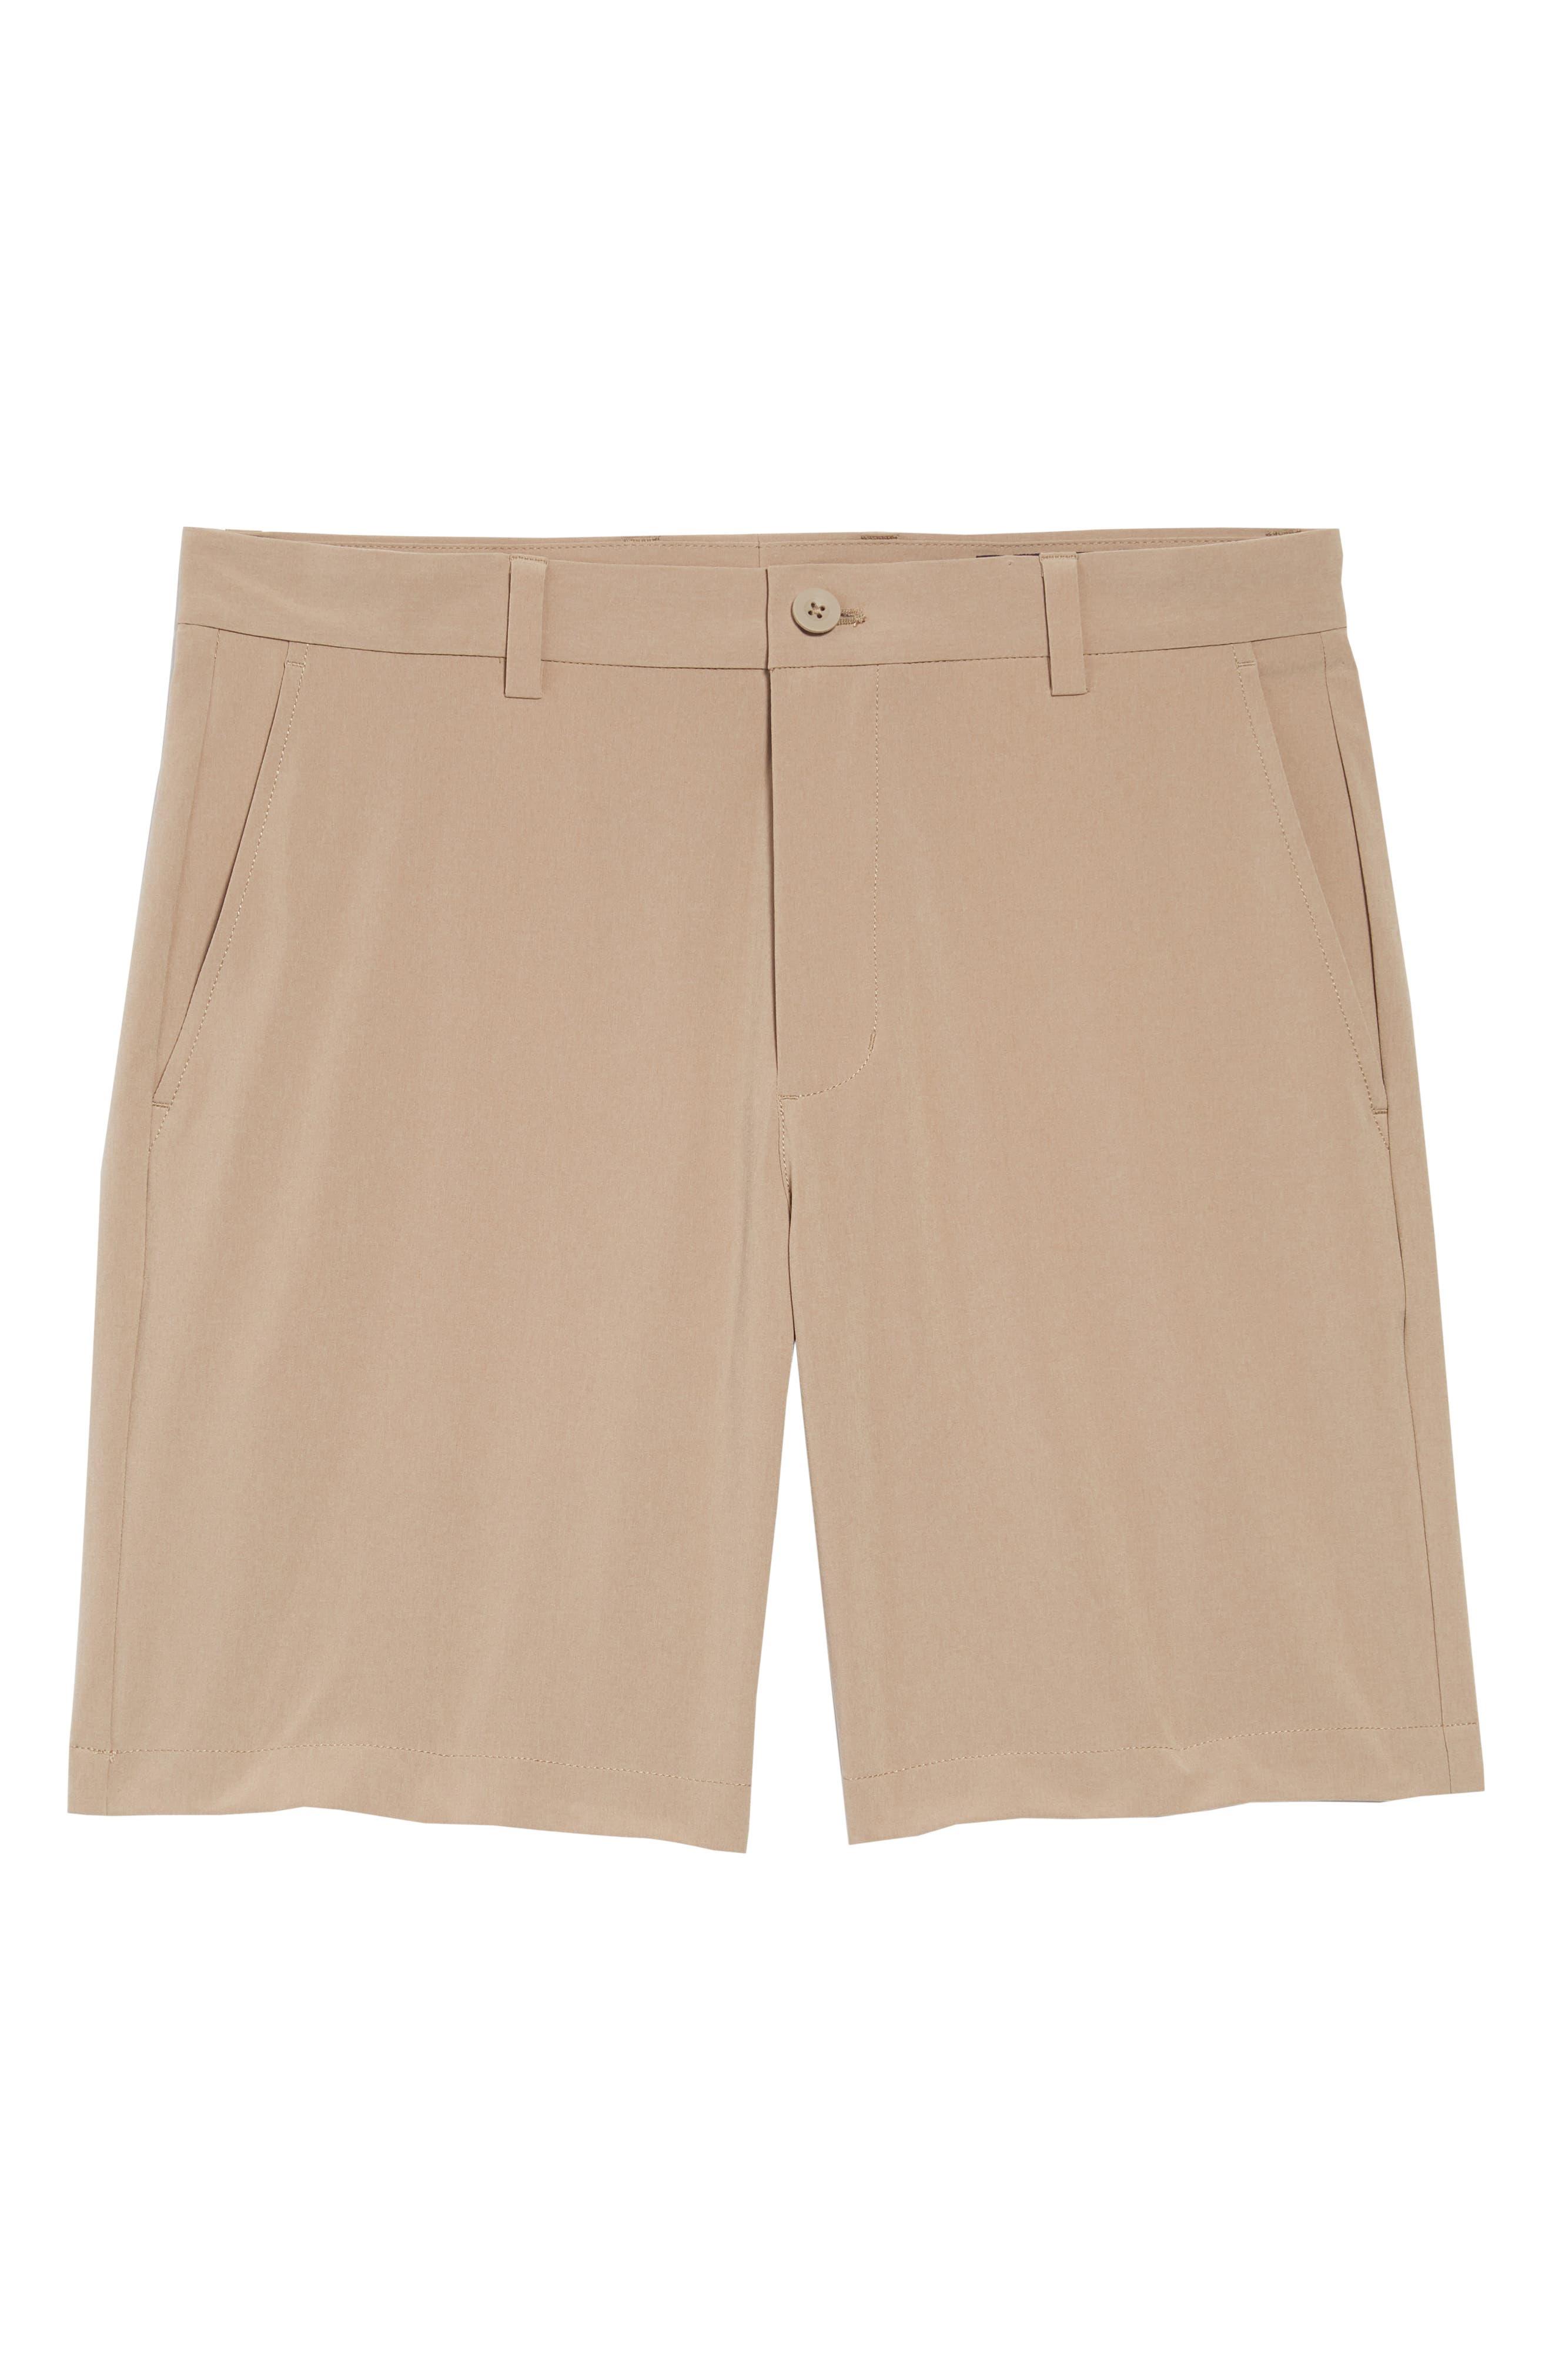 8 Inch Performance Breaker Shorts,                             Alternate thumbnail 18, color,